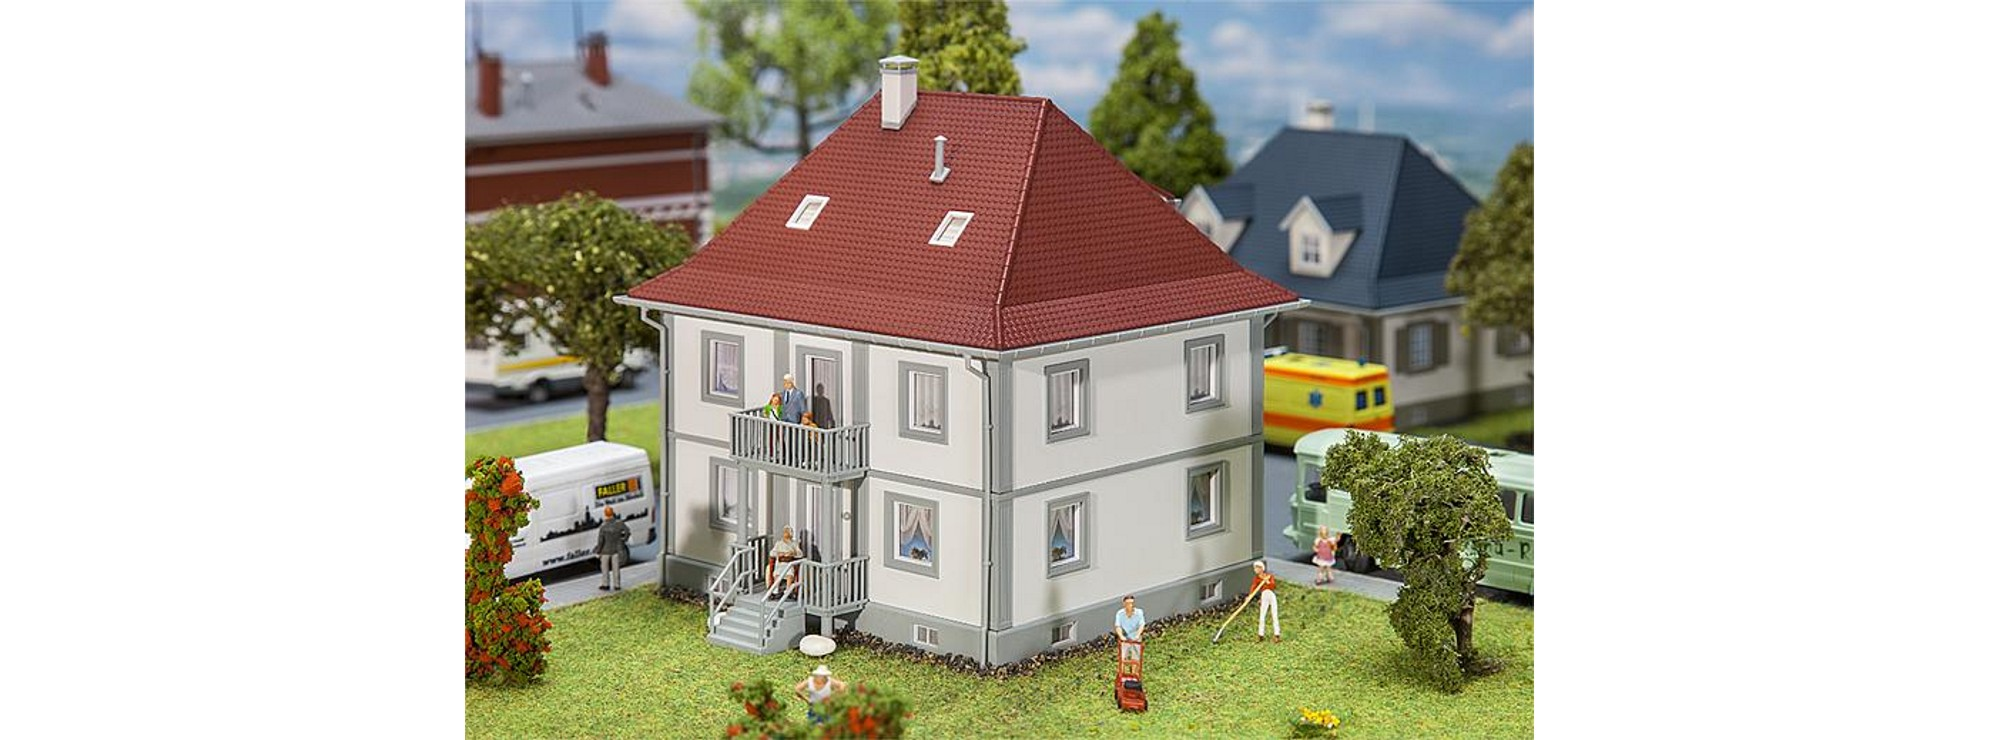 Faller 130460 Wohnhaus Bachstraße 5